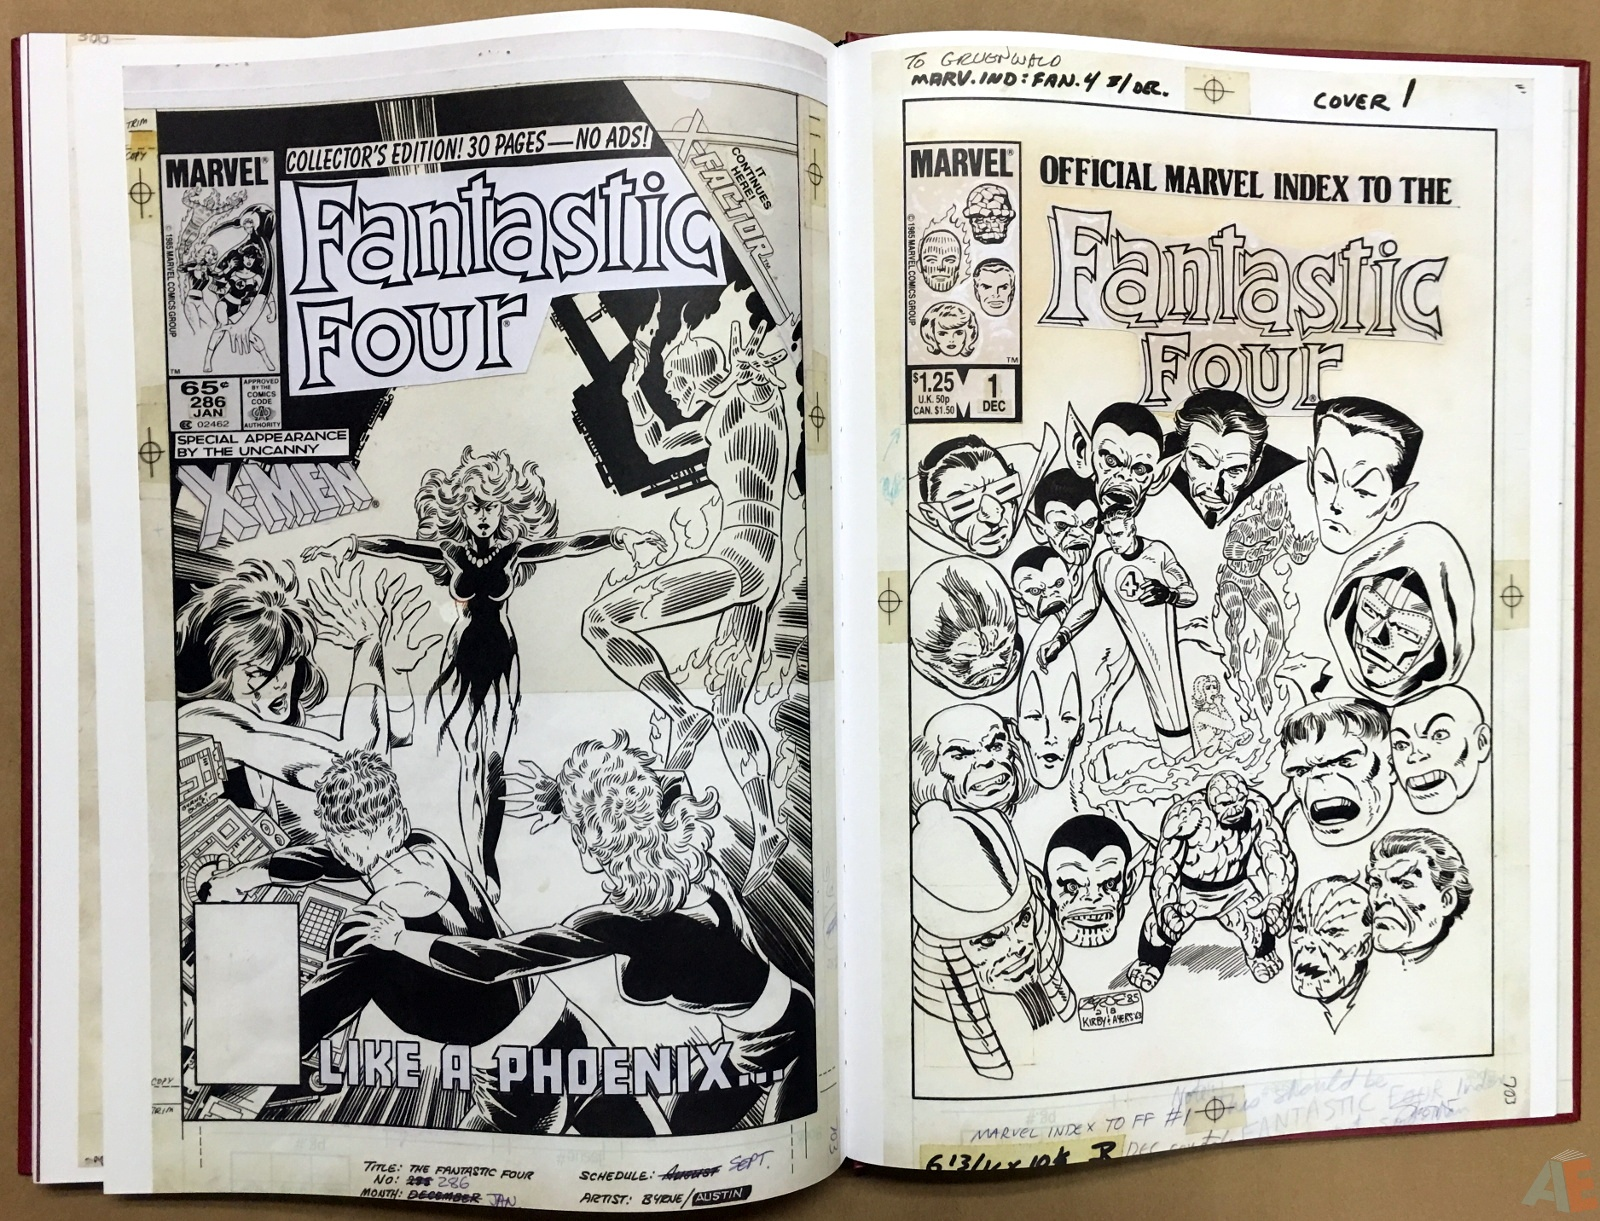 John Byrne's The Fantastic Four Artist's Edition 58